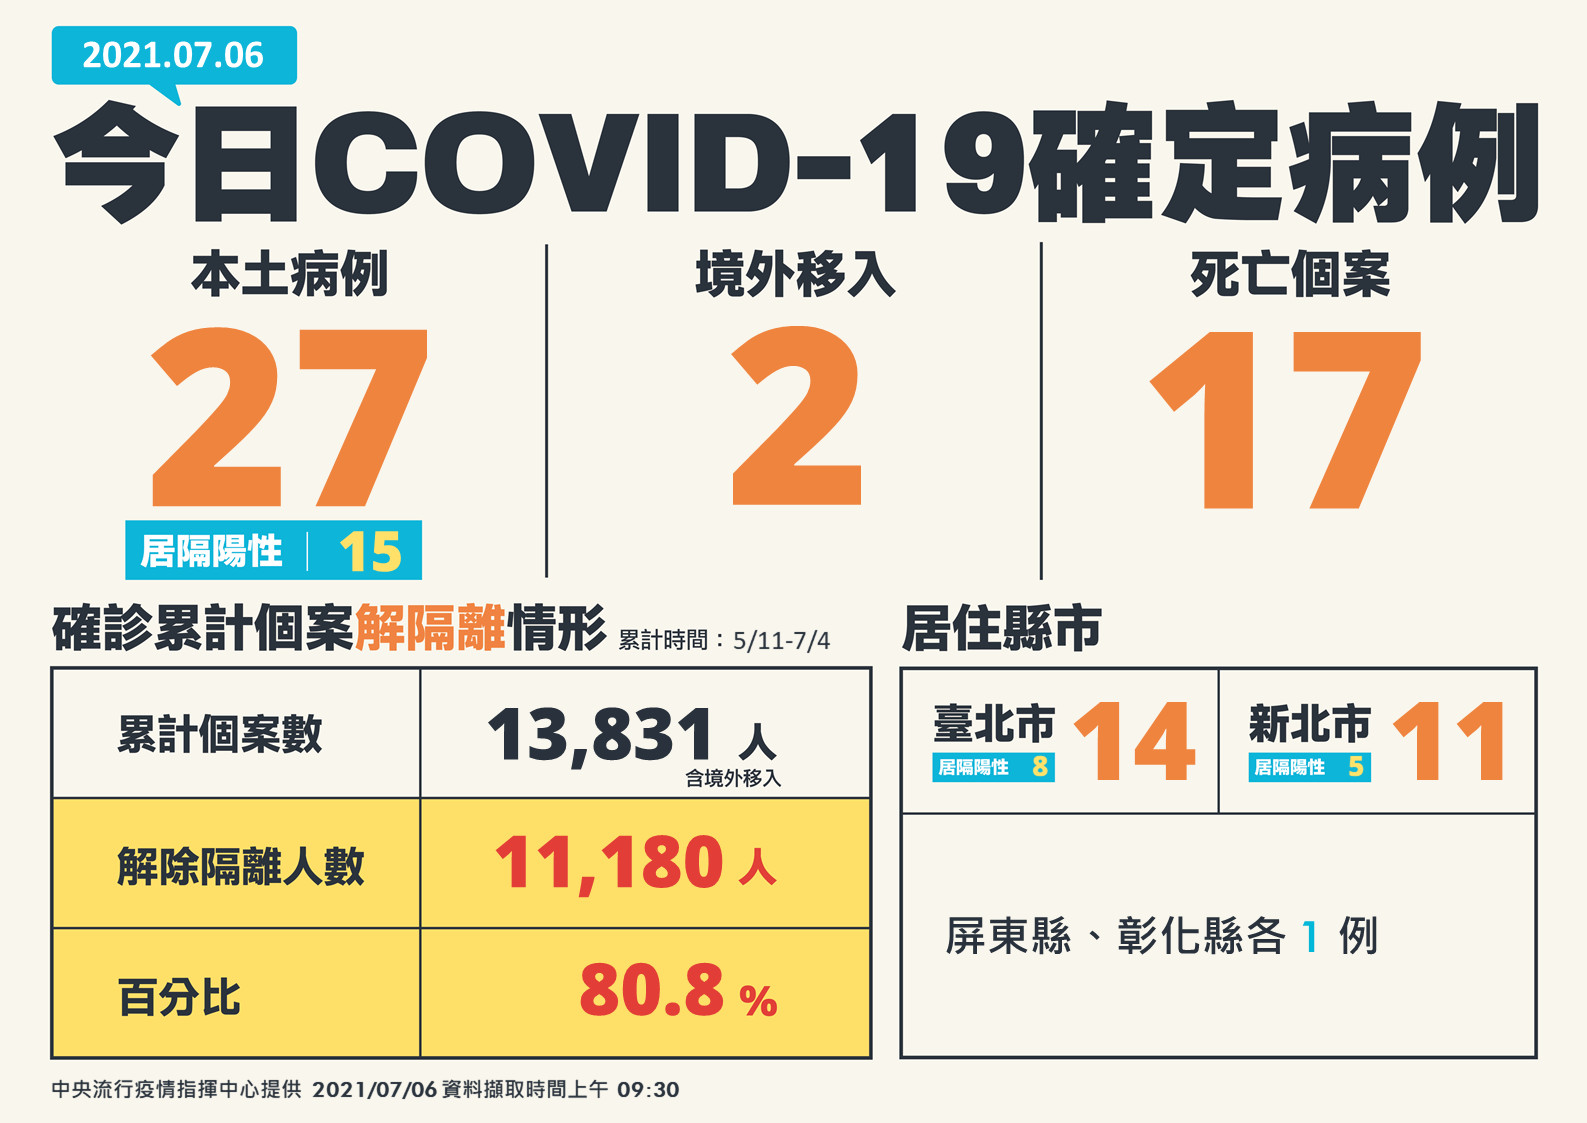 COVID-19,疫情,疫苗,解封,指揮中心,行政院,德國,經濟